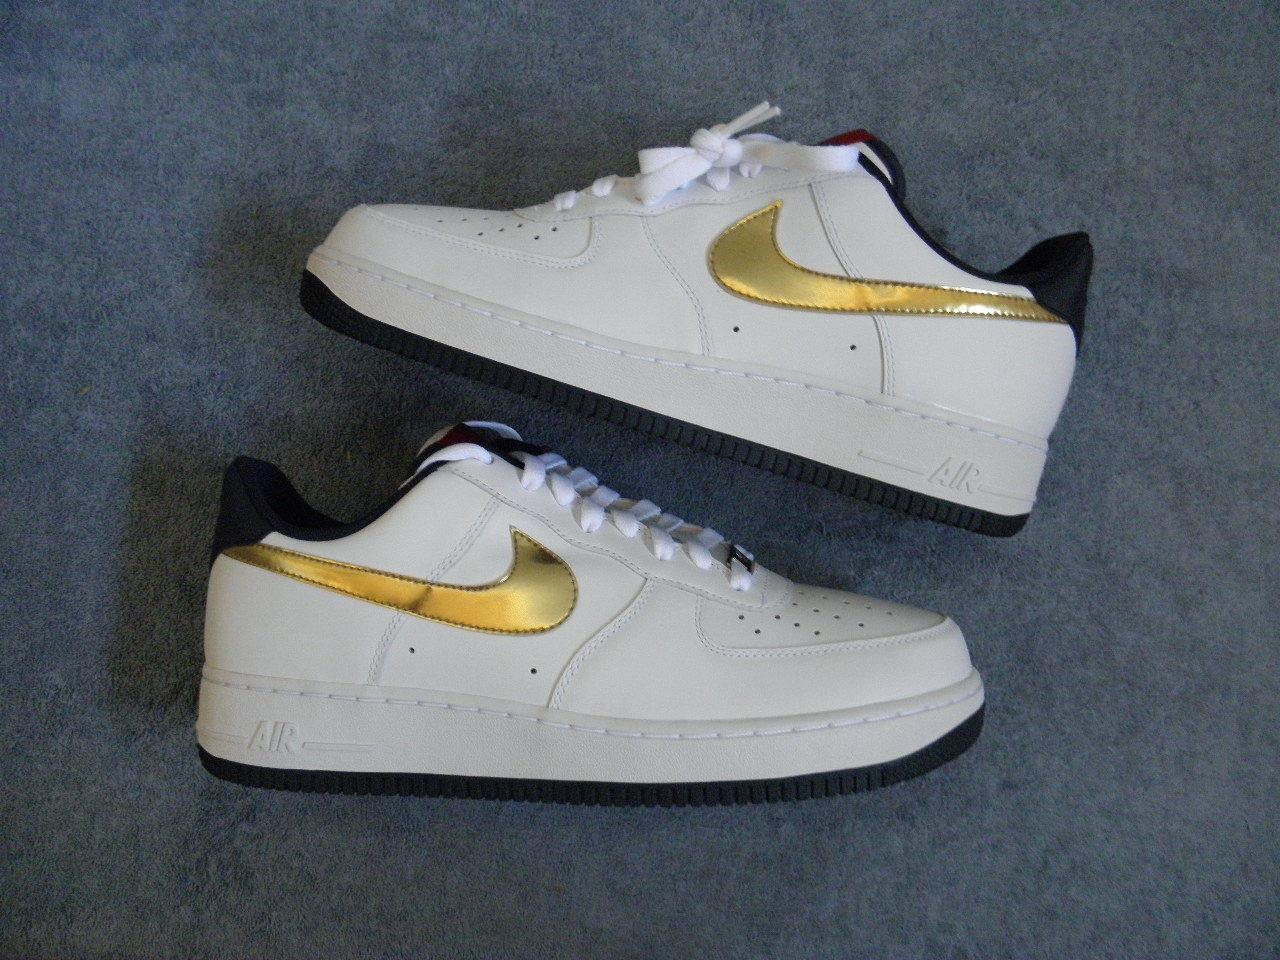 Nike Air Force Charles TEAM Barkley One 1 I Olympic Dream TEAM Charles USA Olympic 2018 11 DS 7f22d0